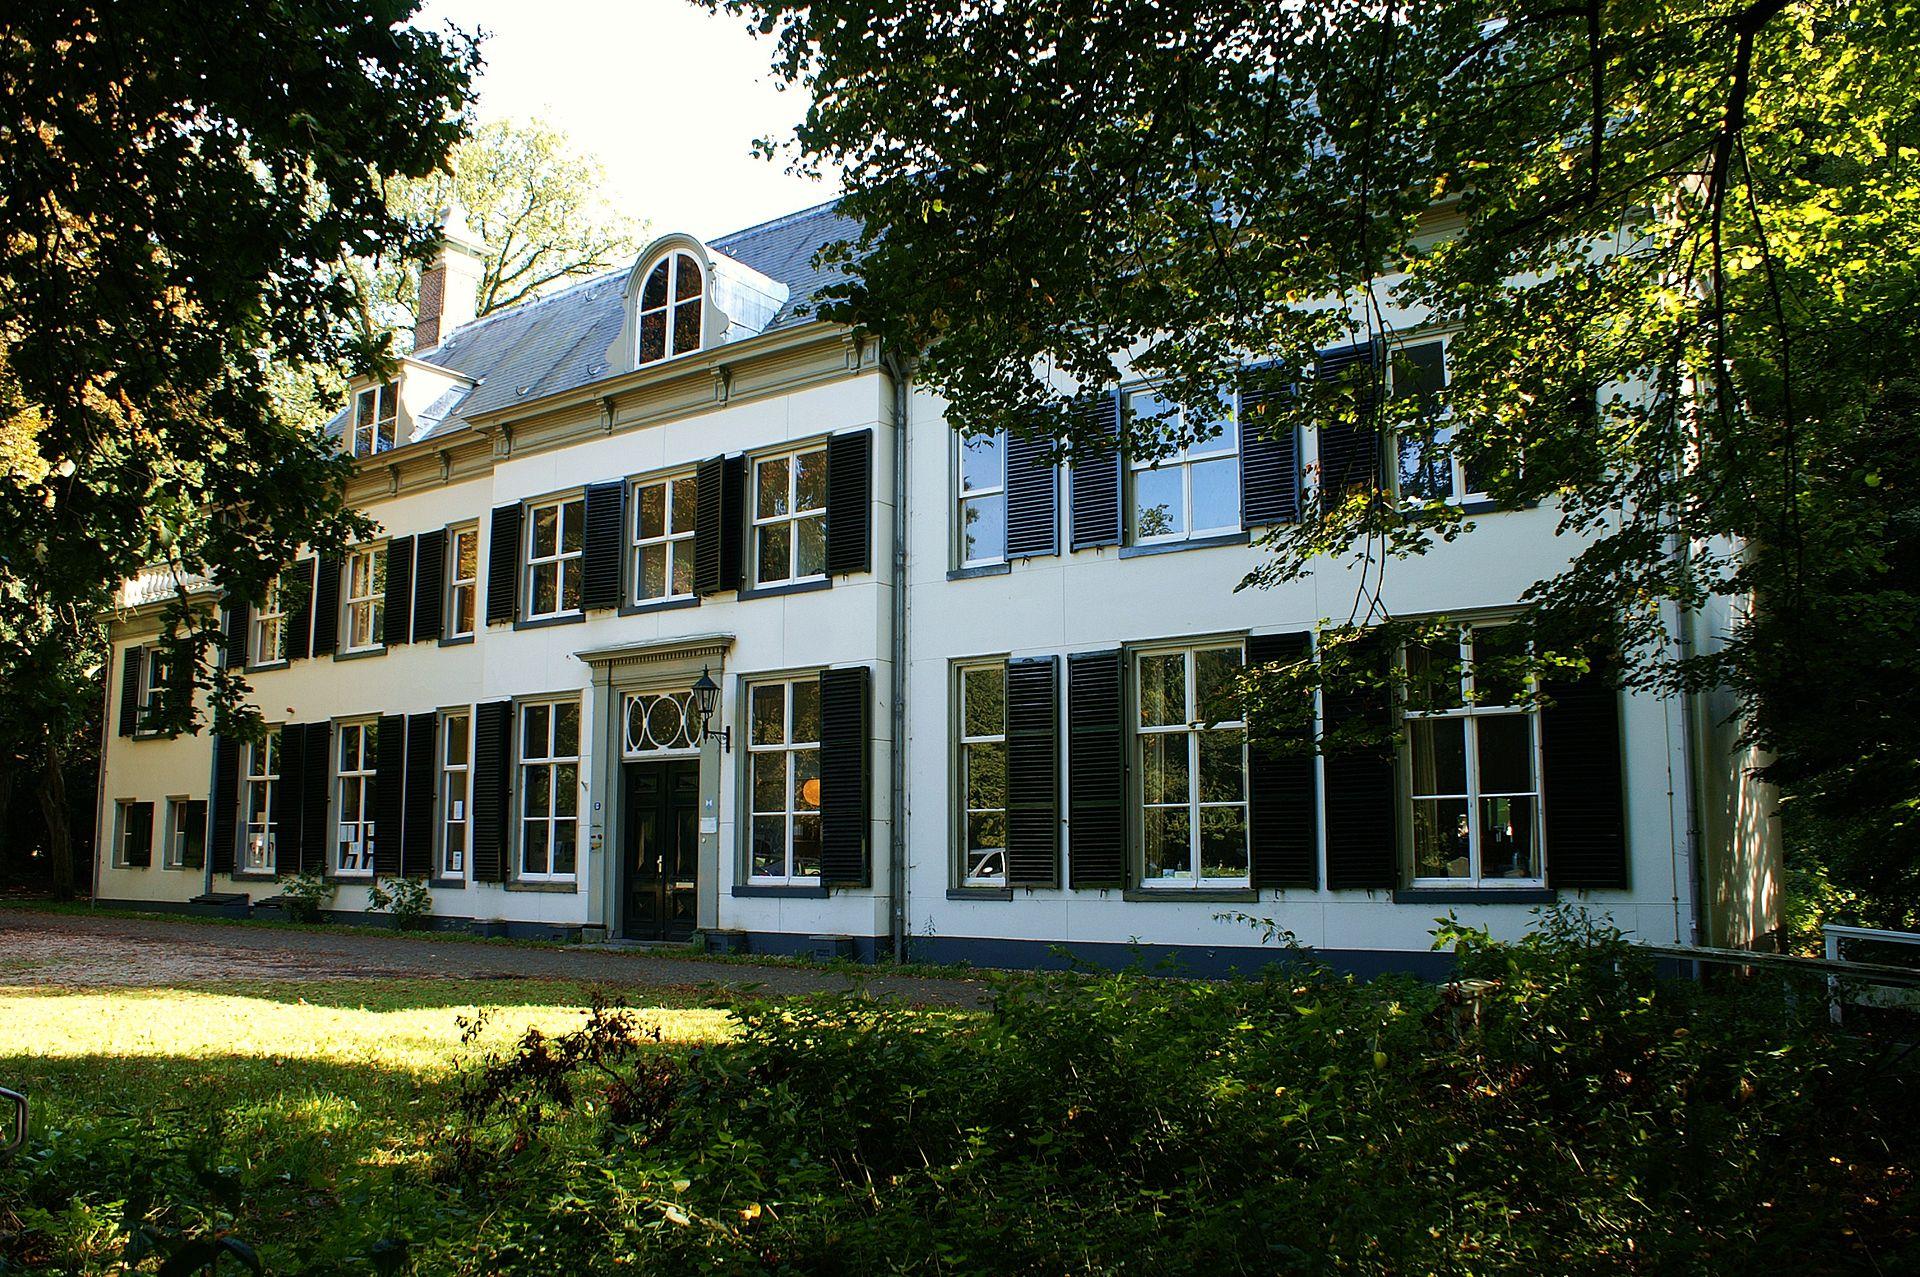 Gemeente Amersfoort legt renovatie Huize Randenbroek stil